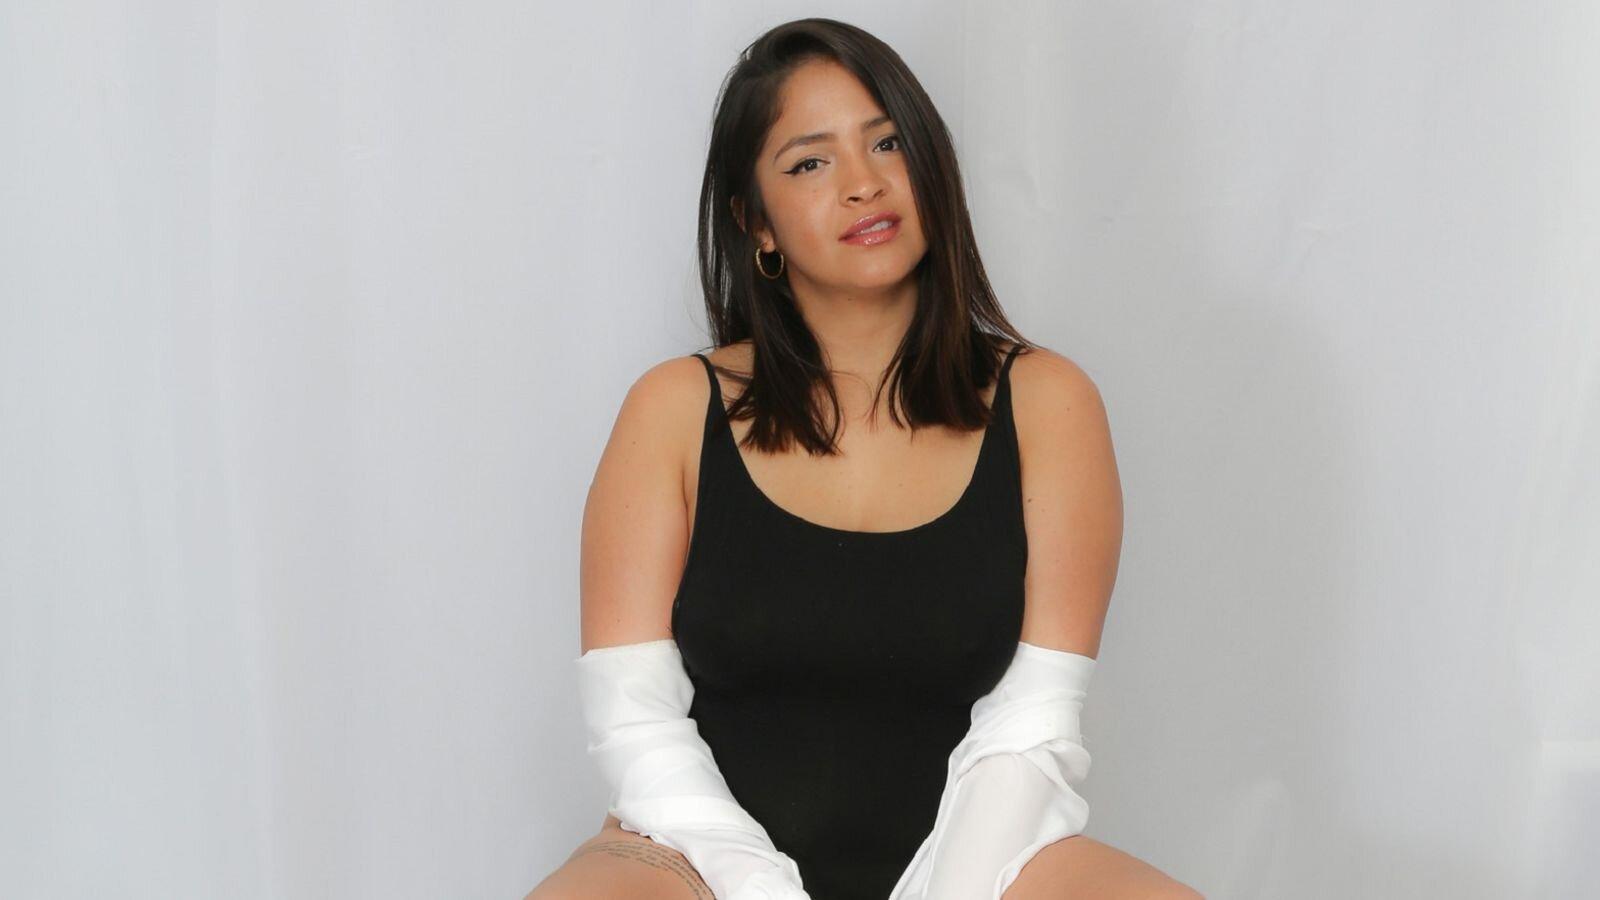 MeganRodriguez